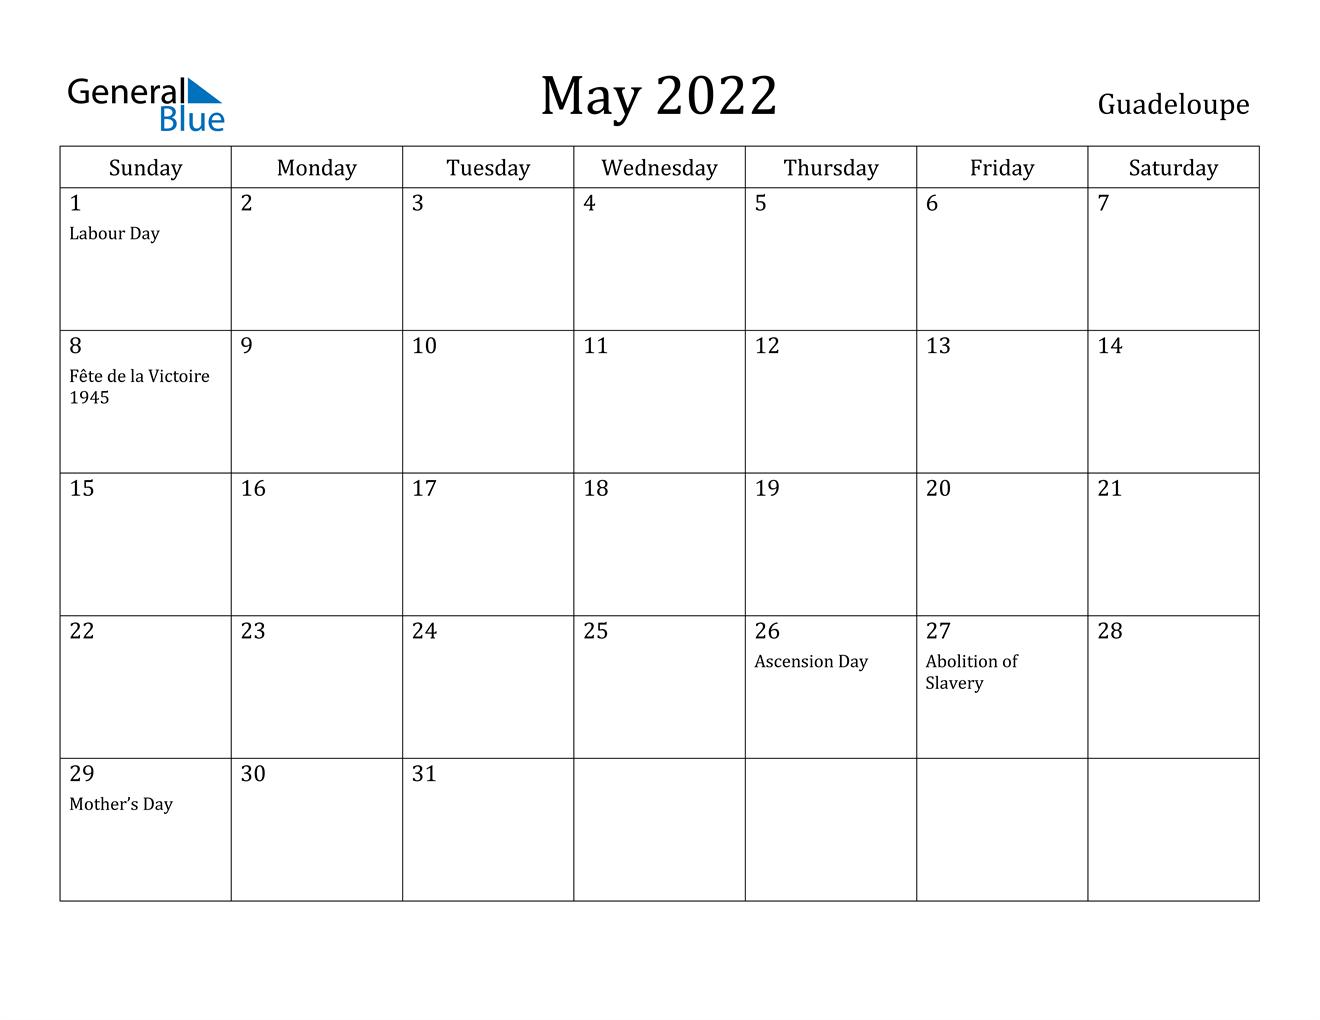 May 2022 Calendar - Guadeloupe